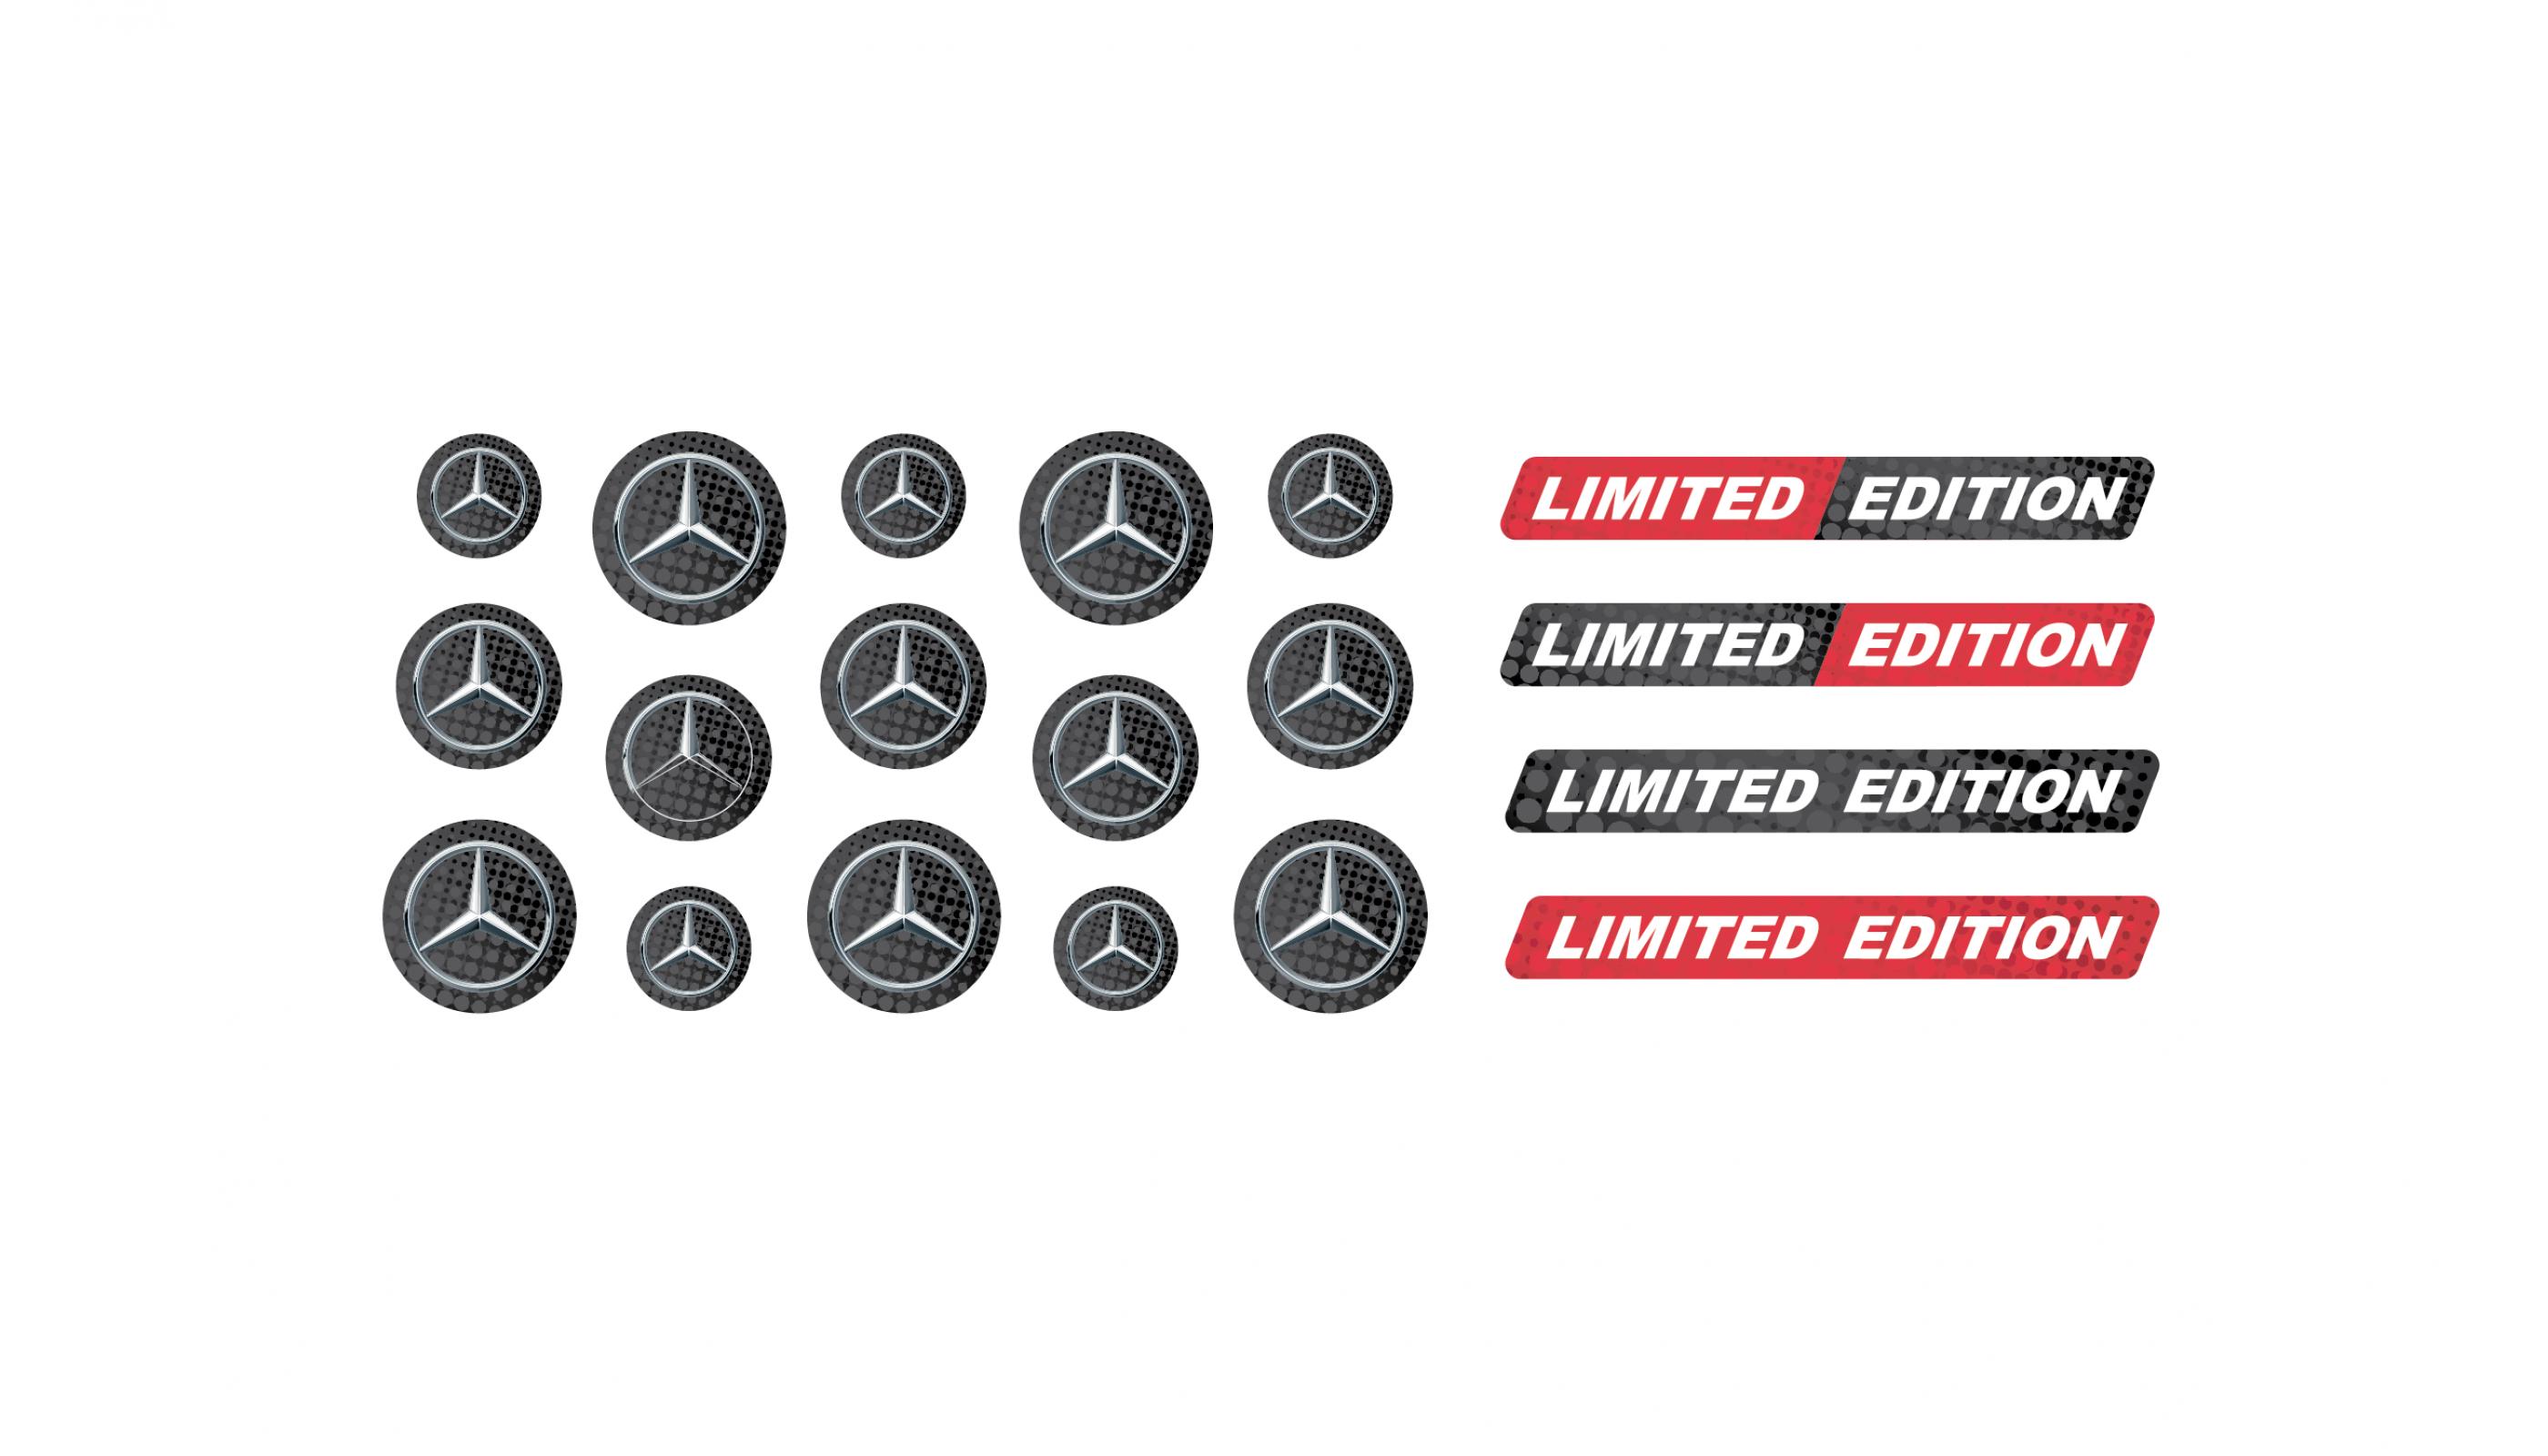 Mercedes domed key fob emblems